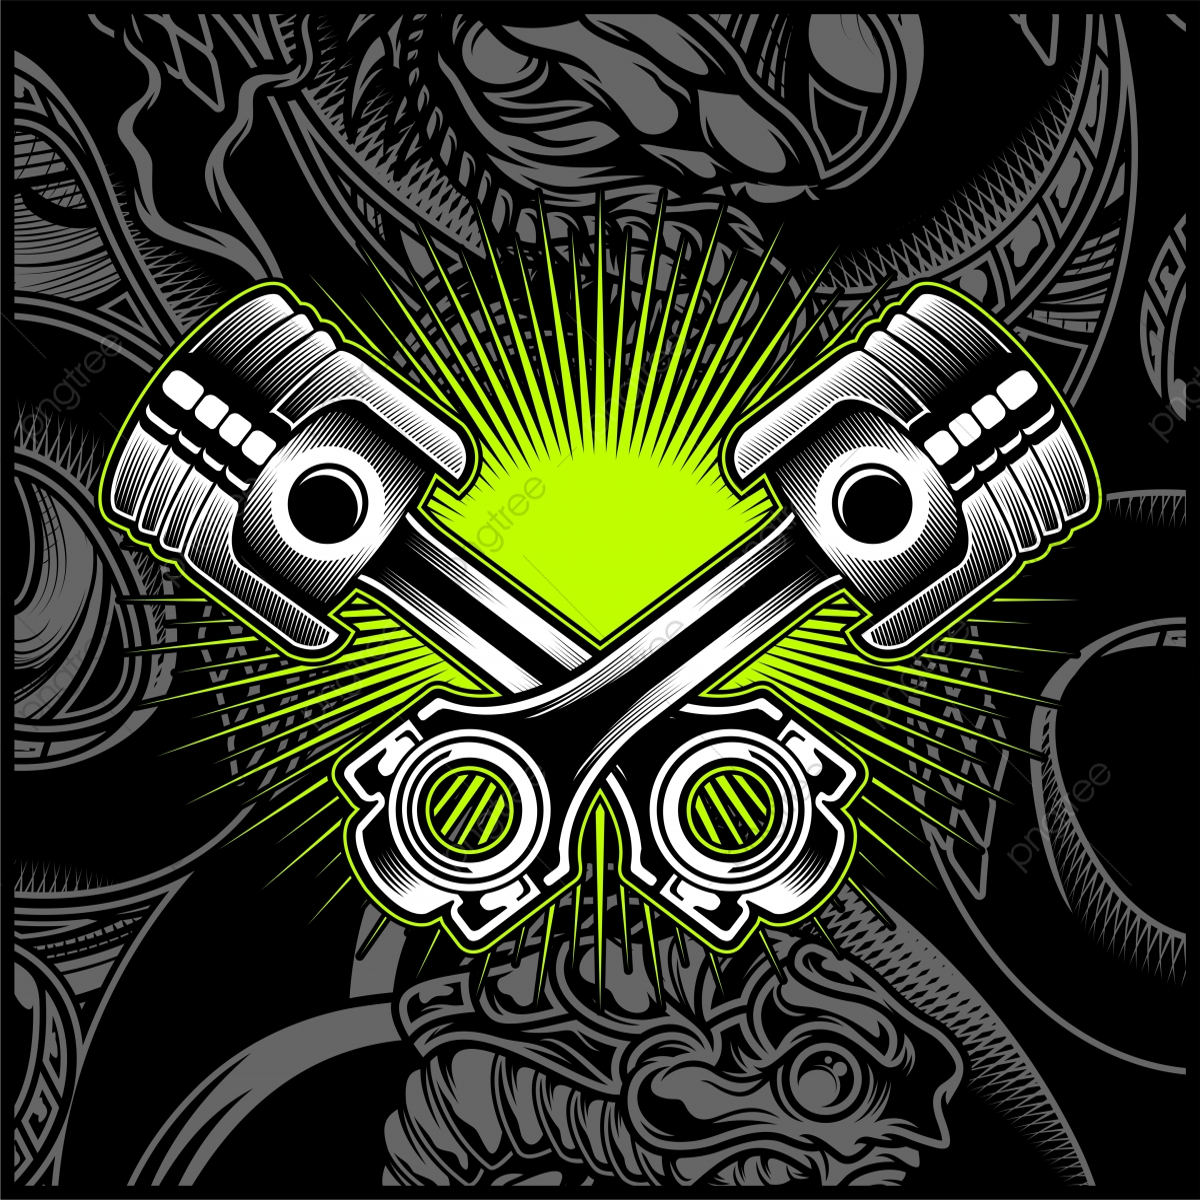 Cross Motorcycle Piston Emblem Logos Badge Vector, Pistons